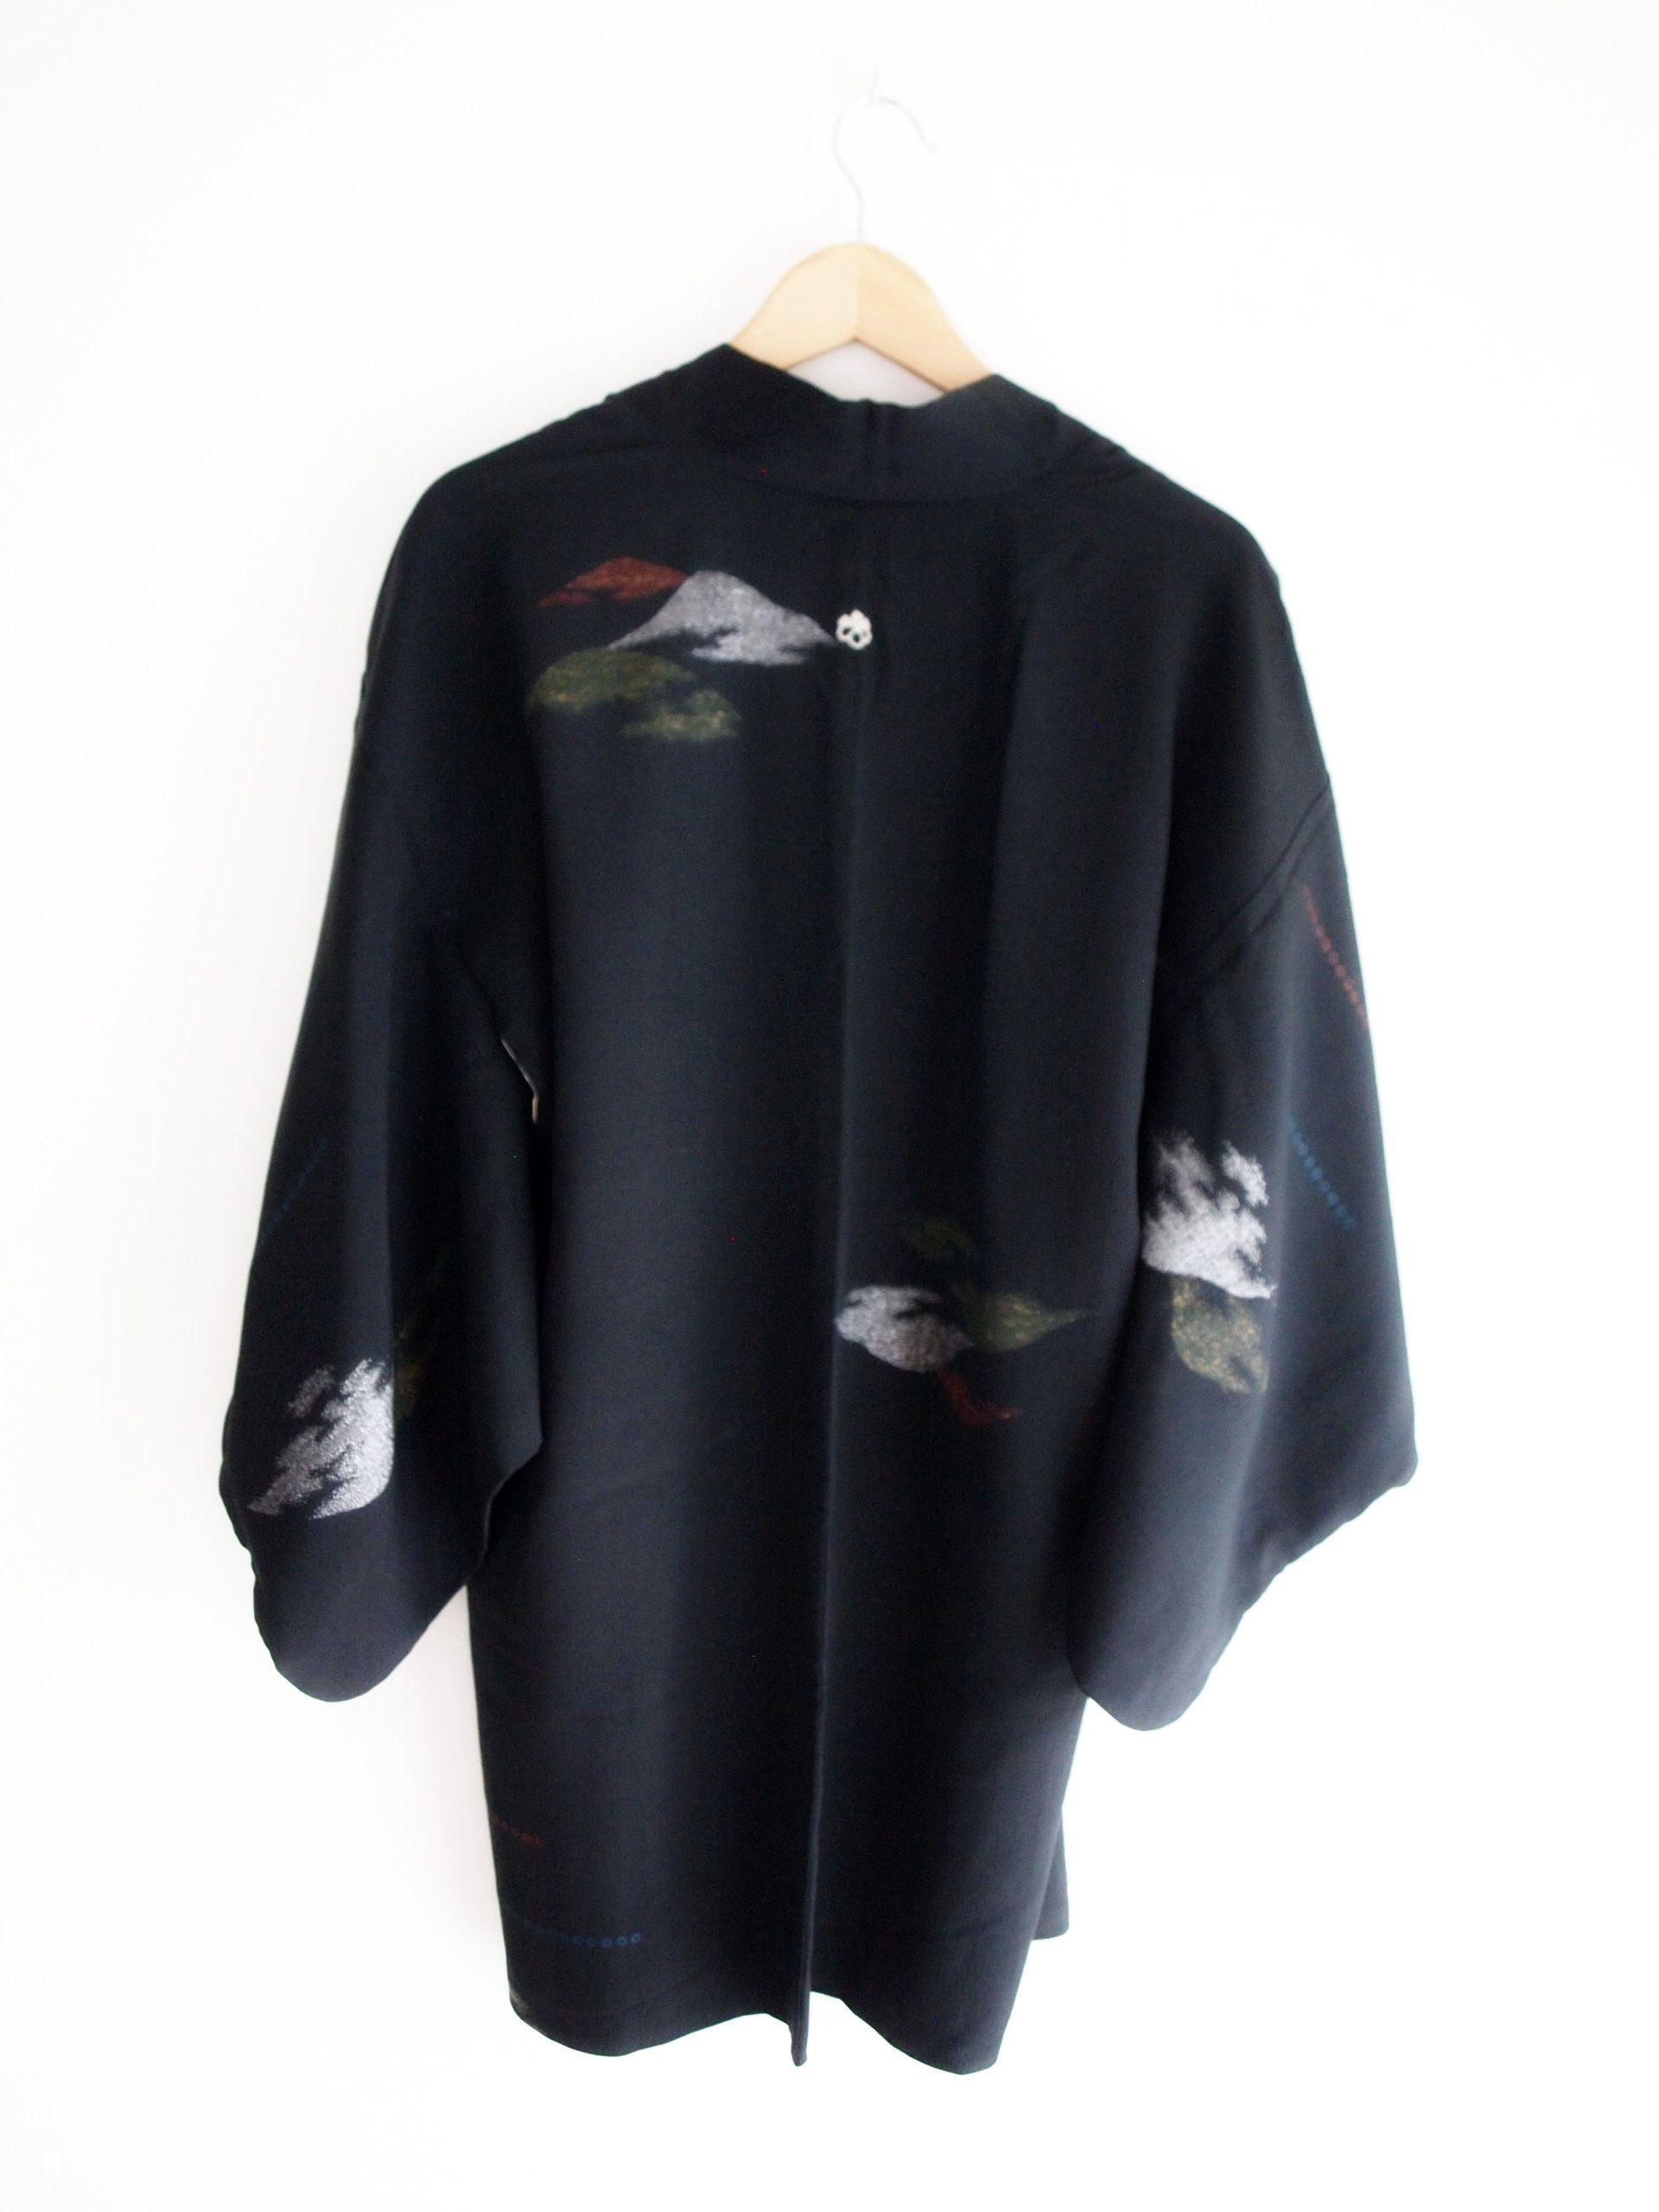 c20c8e400bd Vintage Kimono women - black silk kimono jacket, clouds design ...